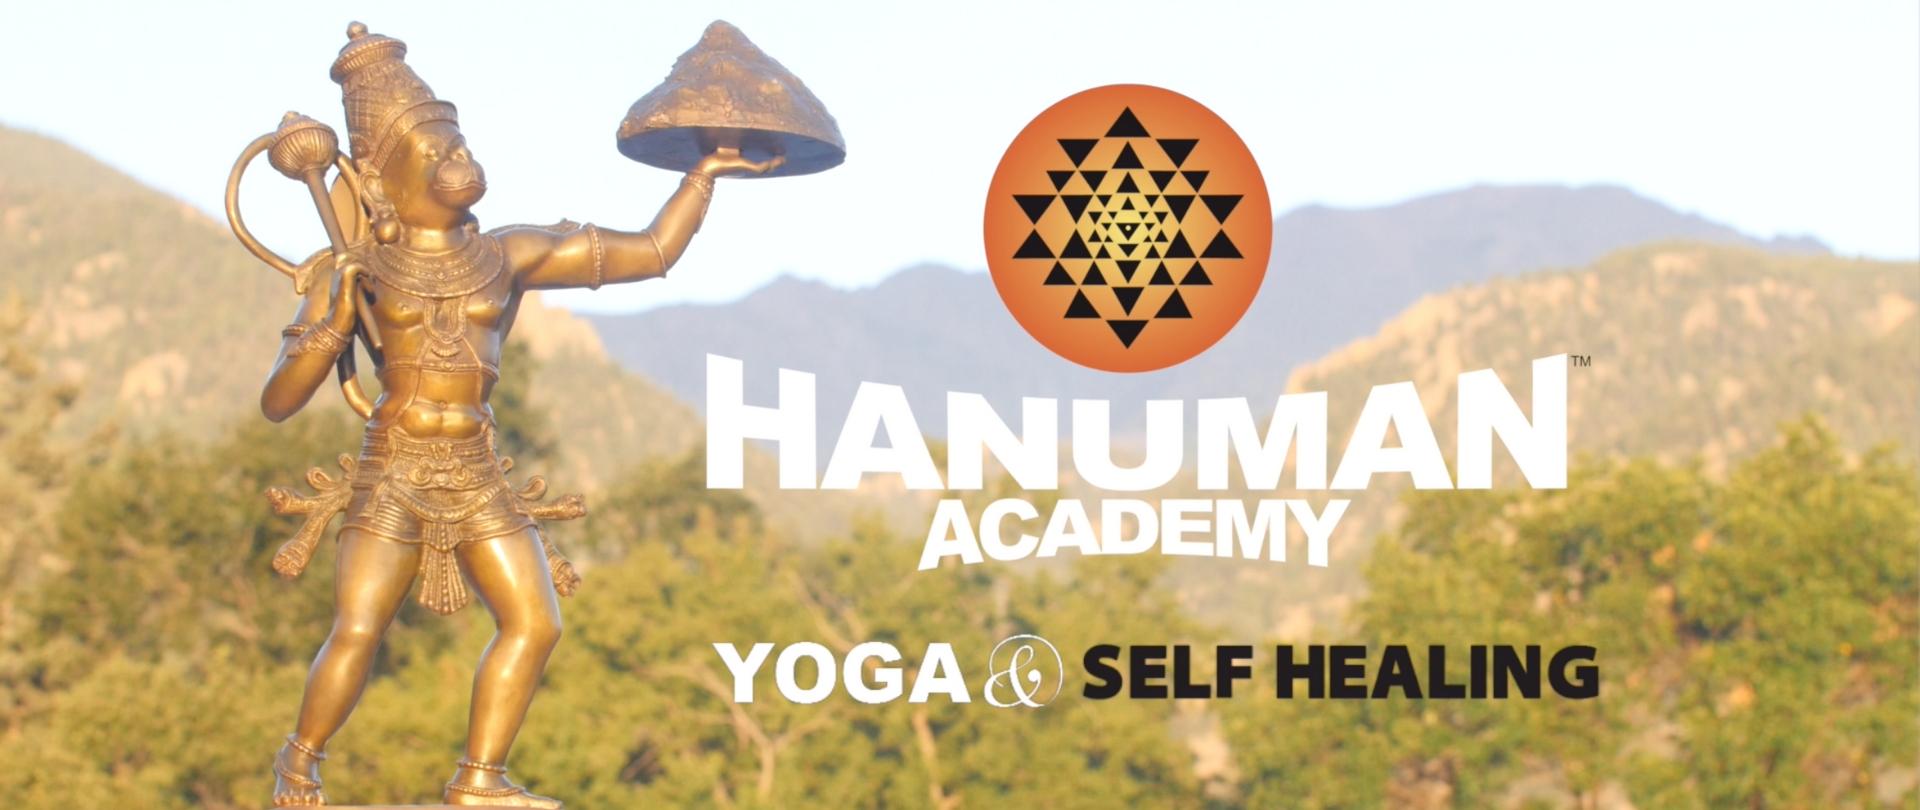 Yoga & Self Healing